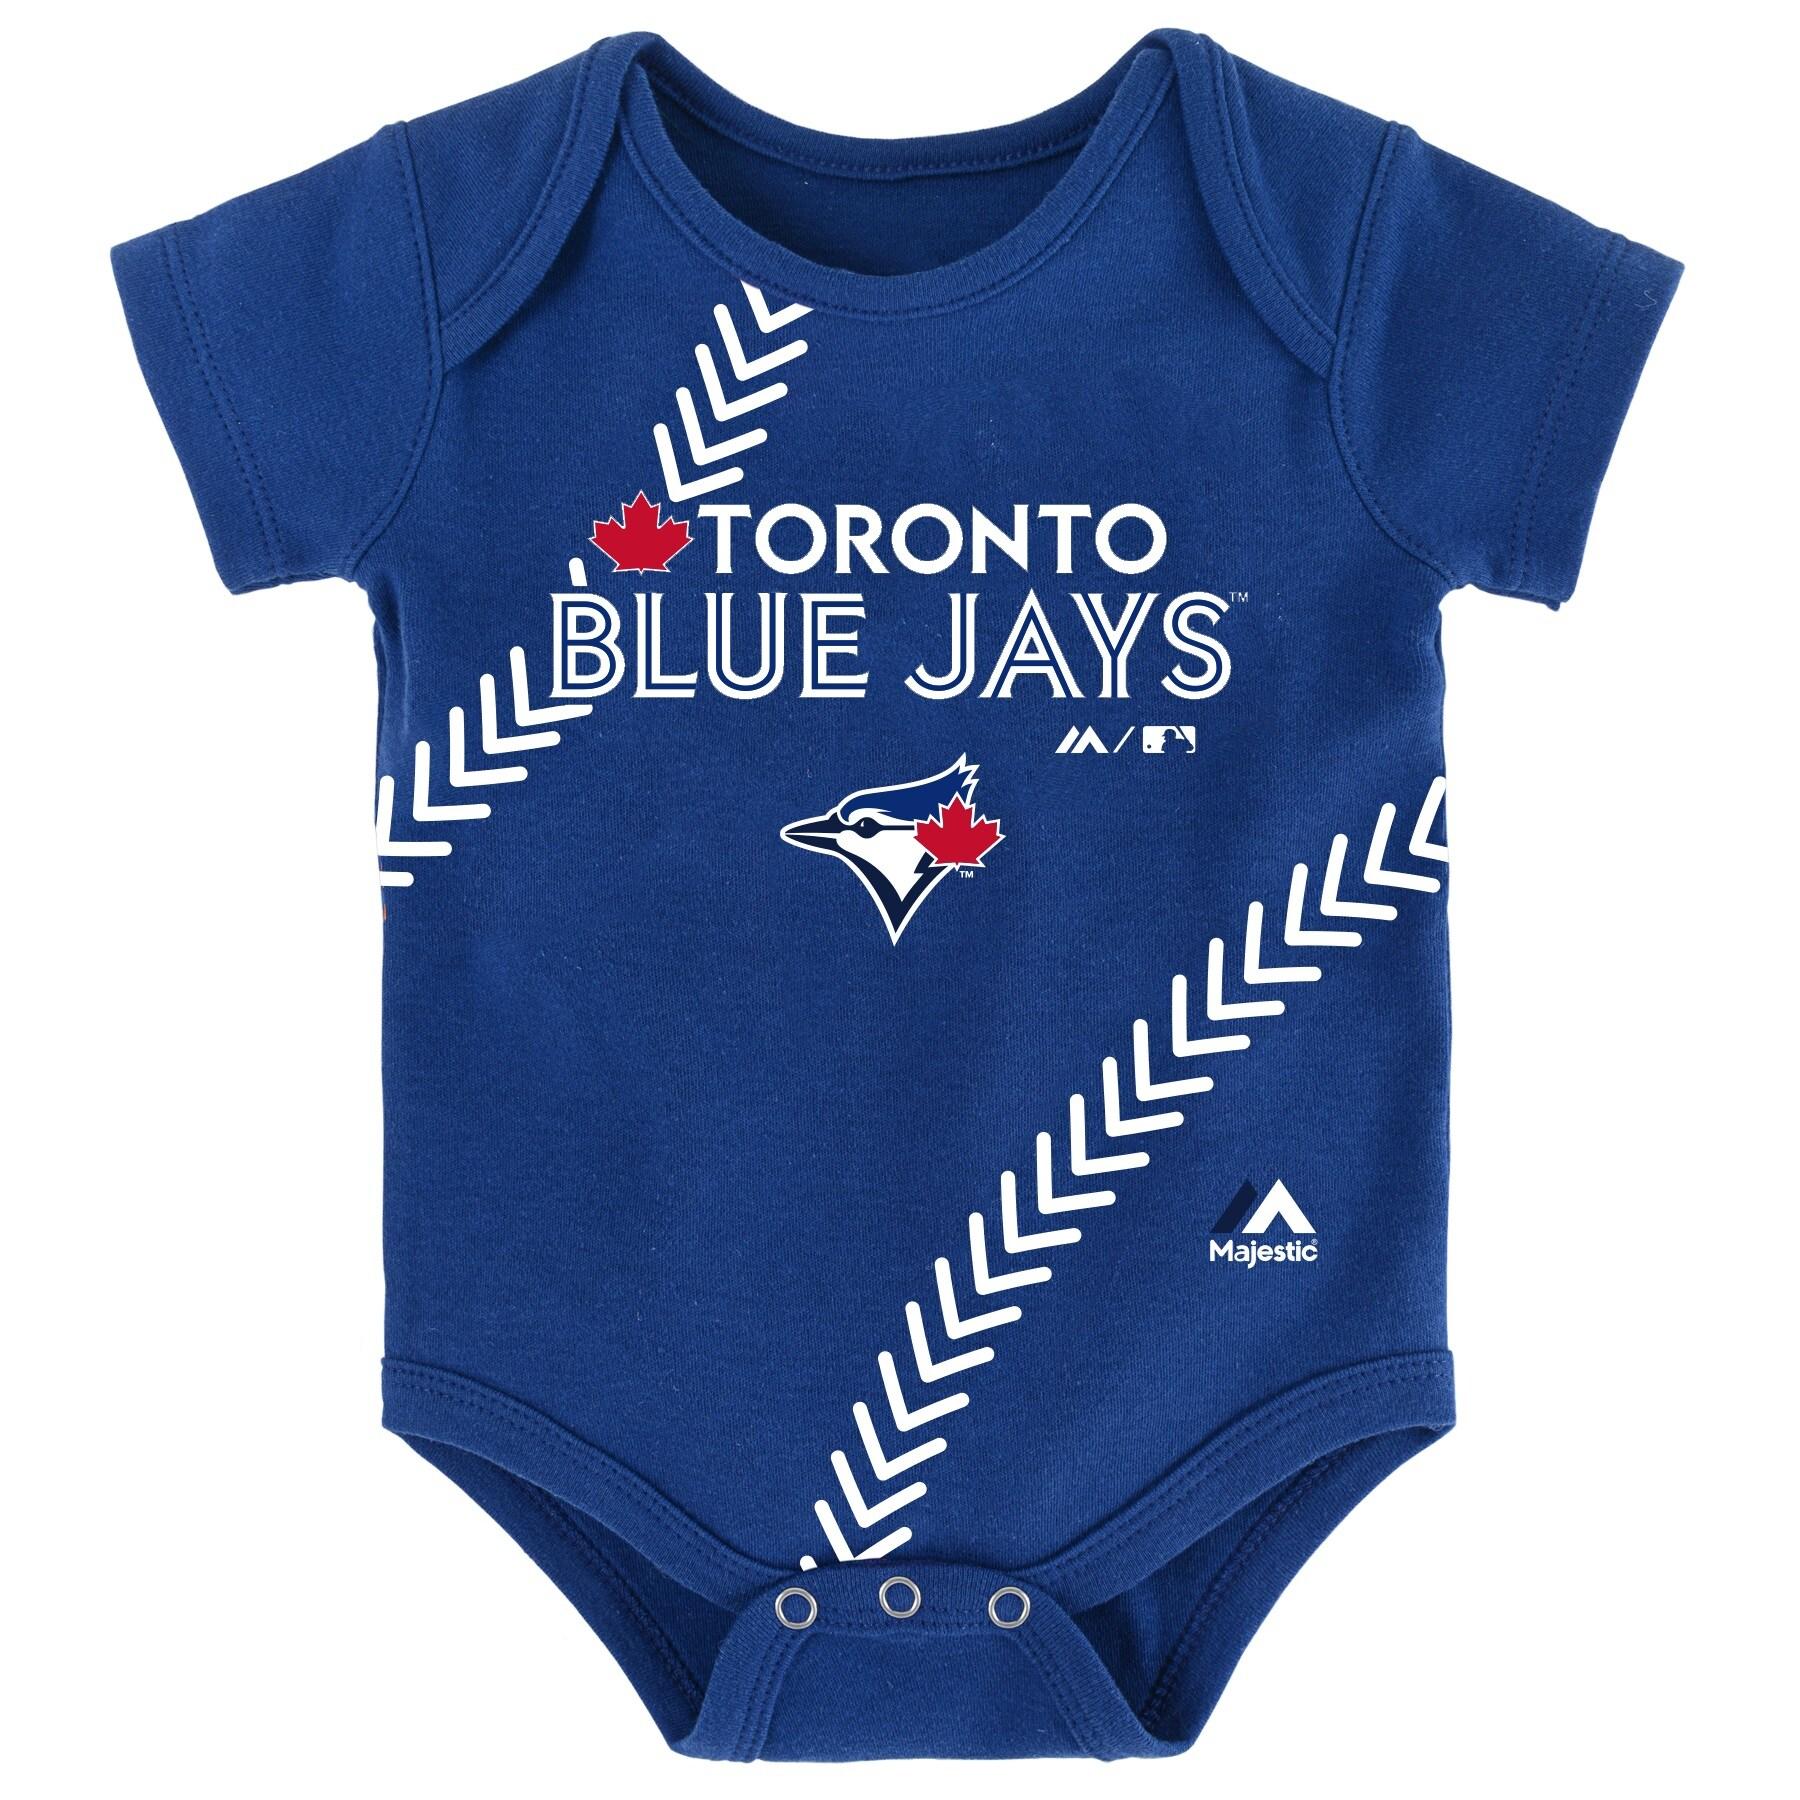 Toronto Blue Jays Majestic Newborn & Infant Fan-Atic Baseball Bodysuit - Royal